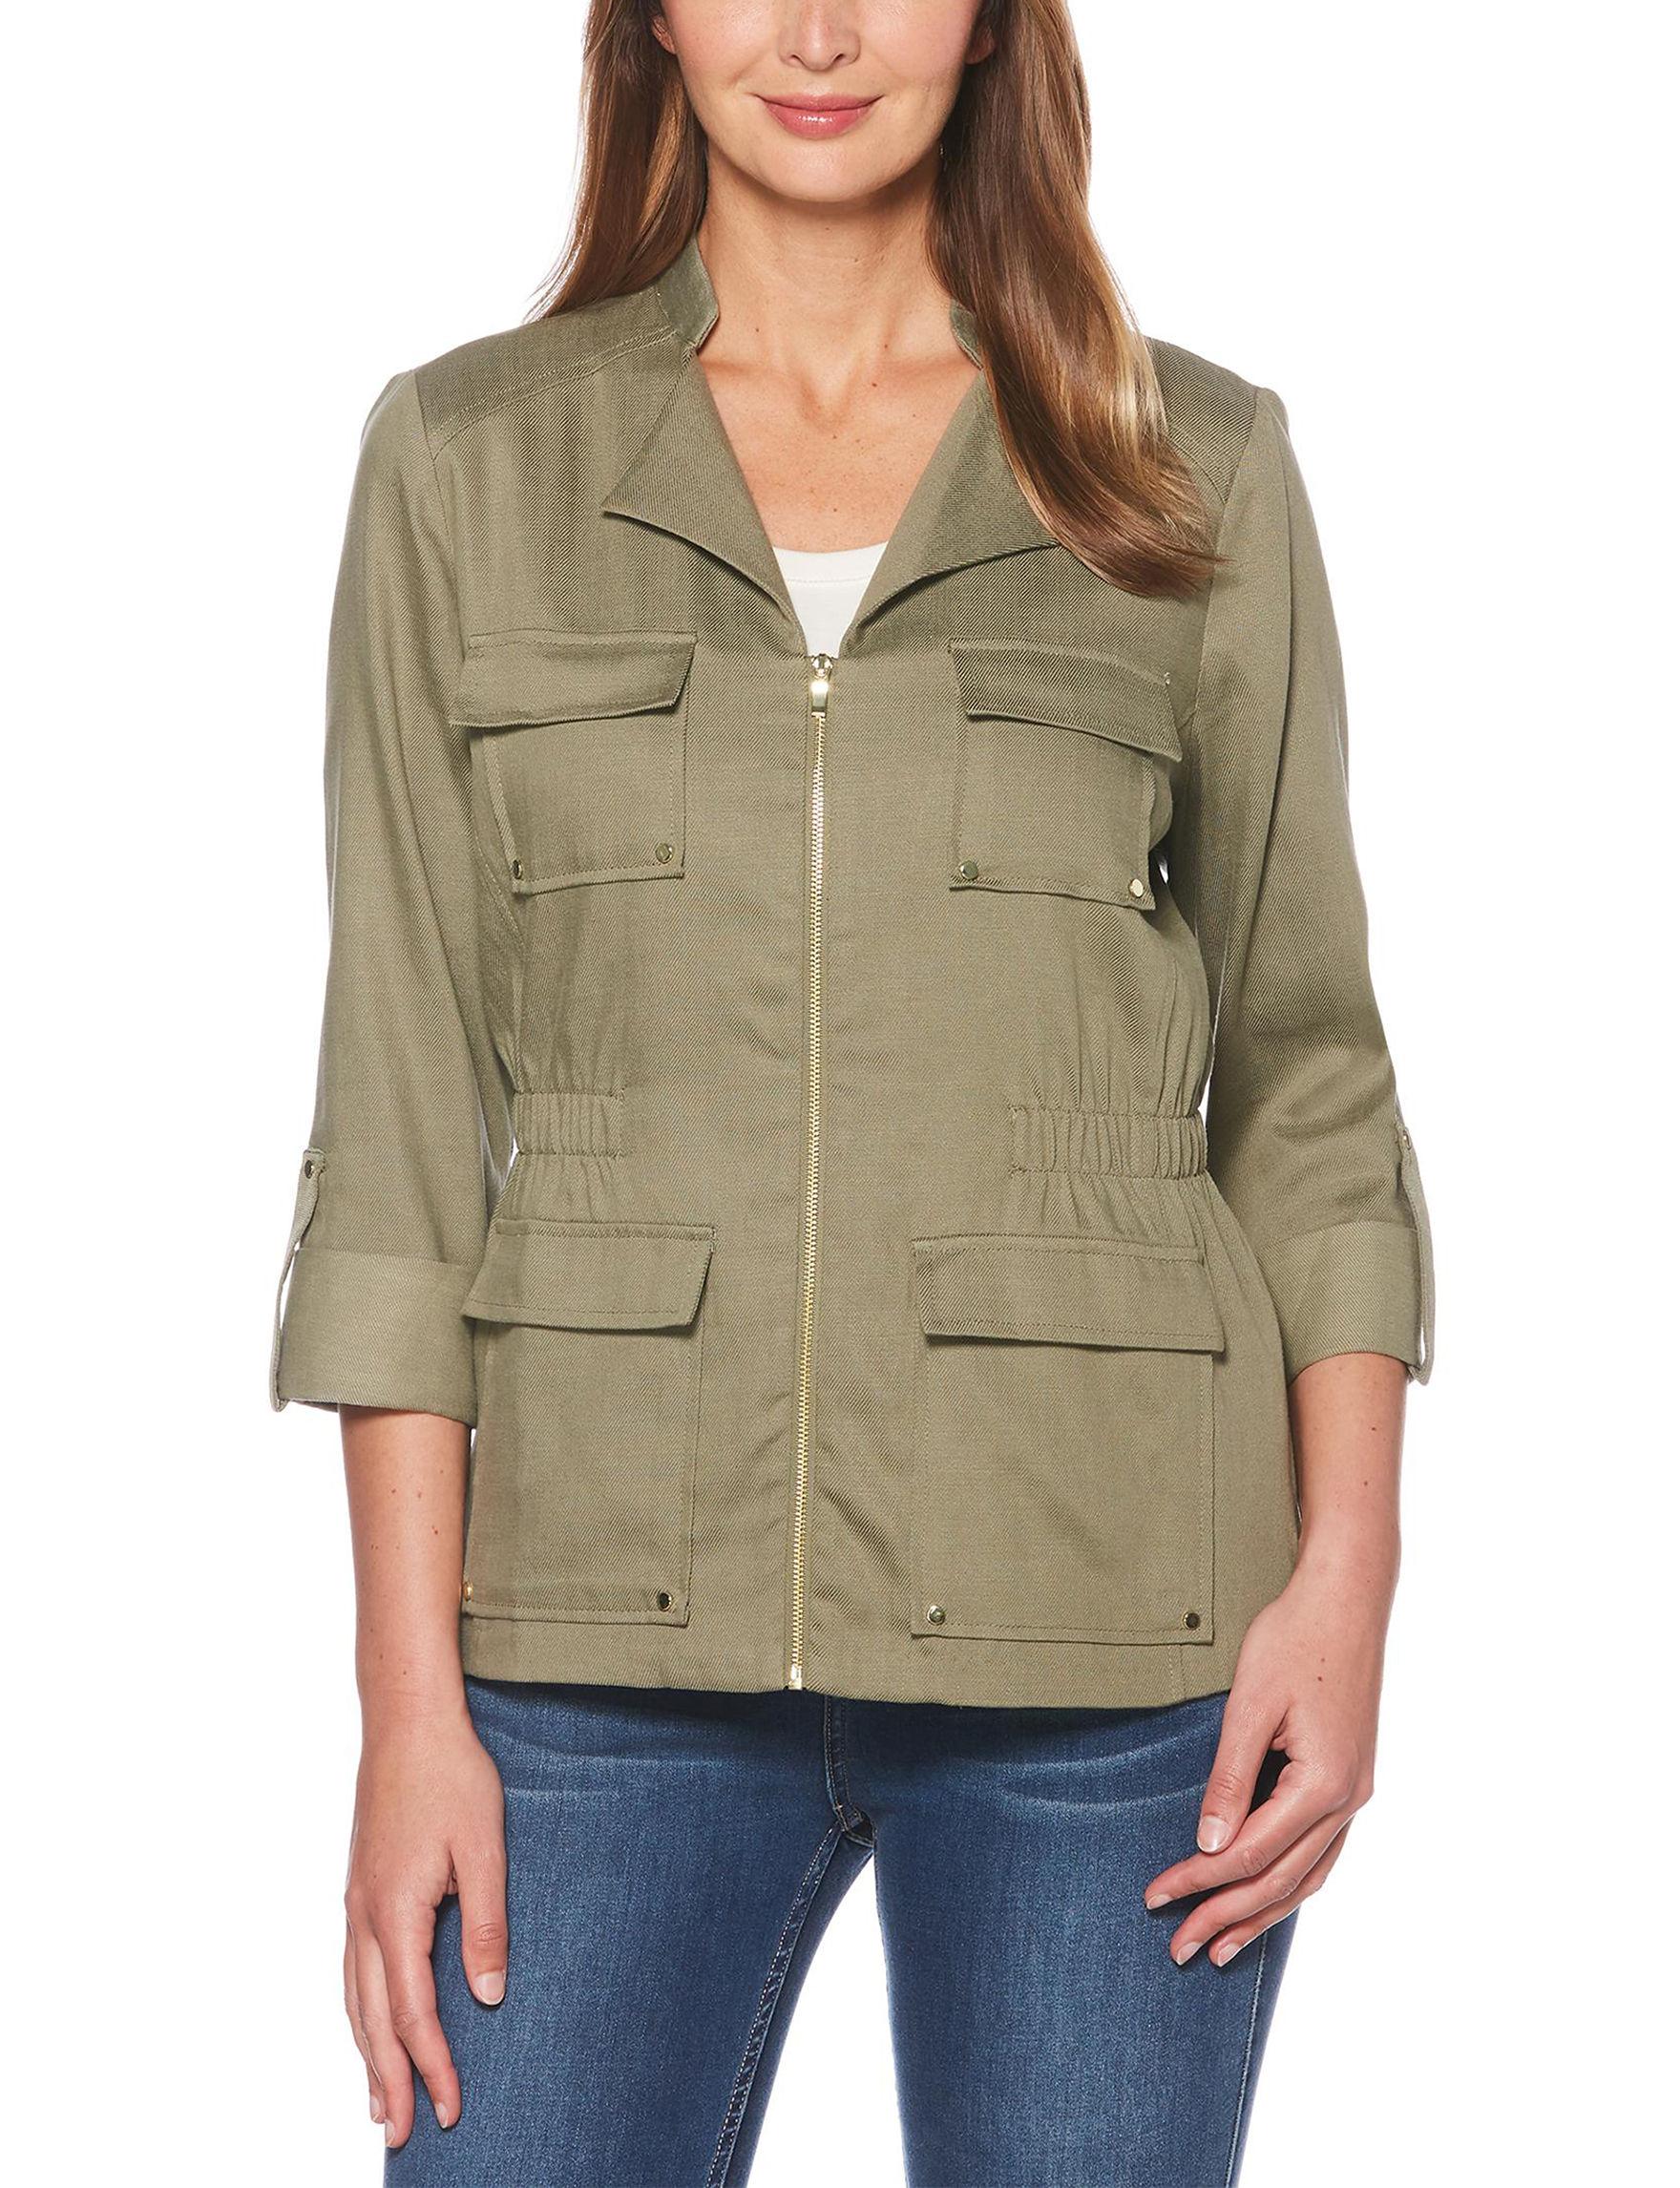 Rafaella Olive Green Lightweight Jackets & Blazers